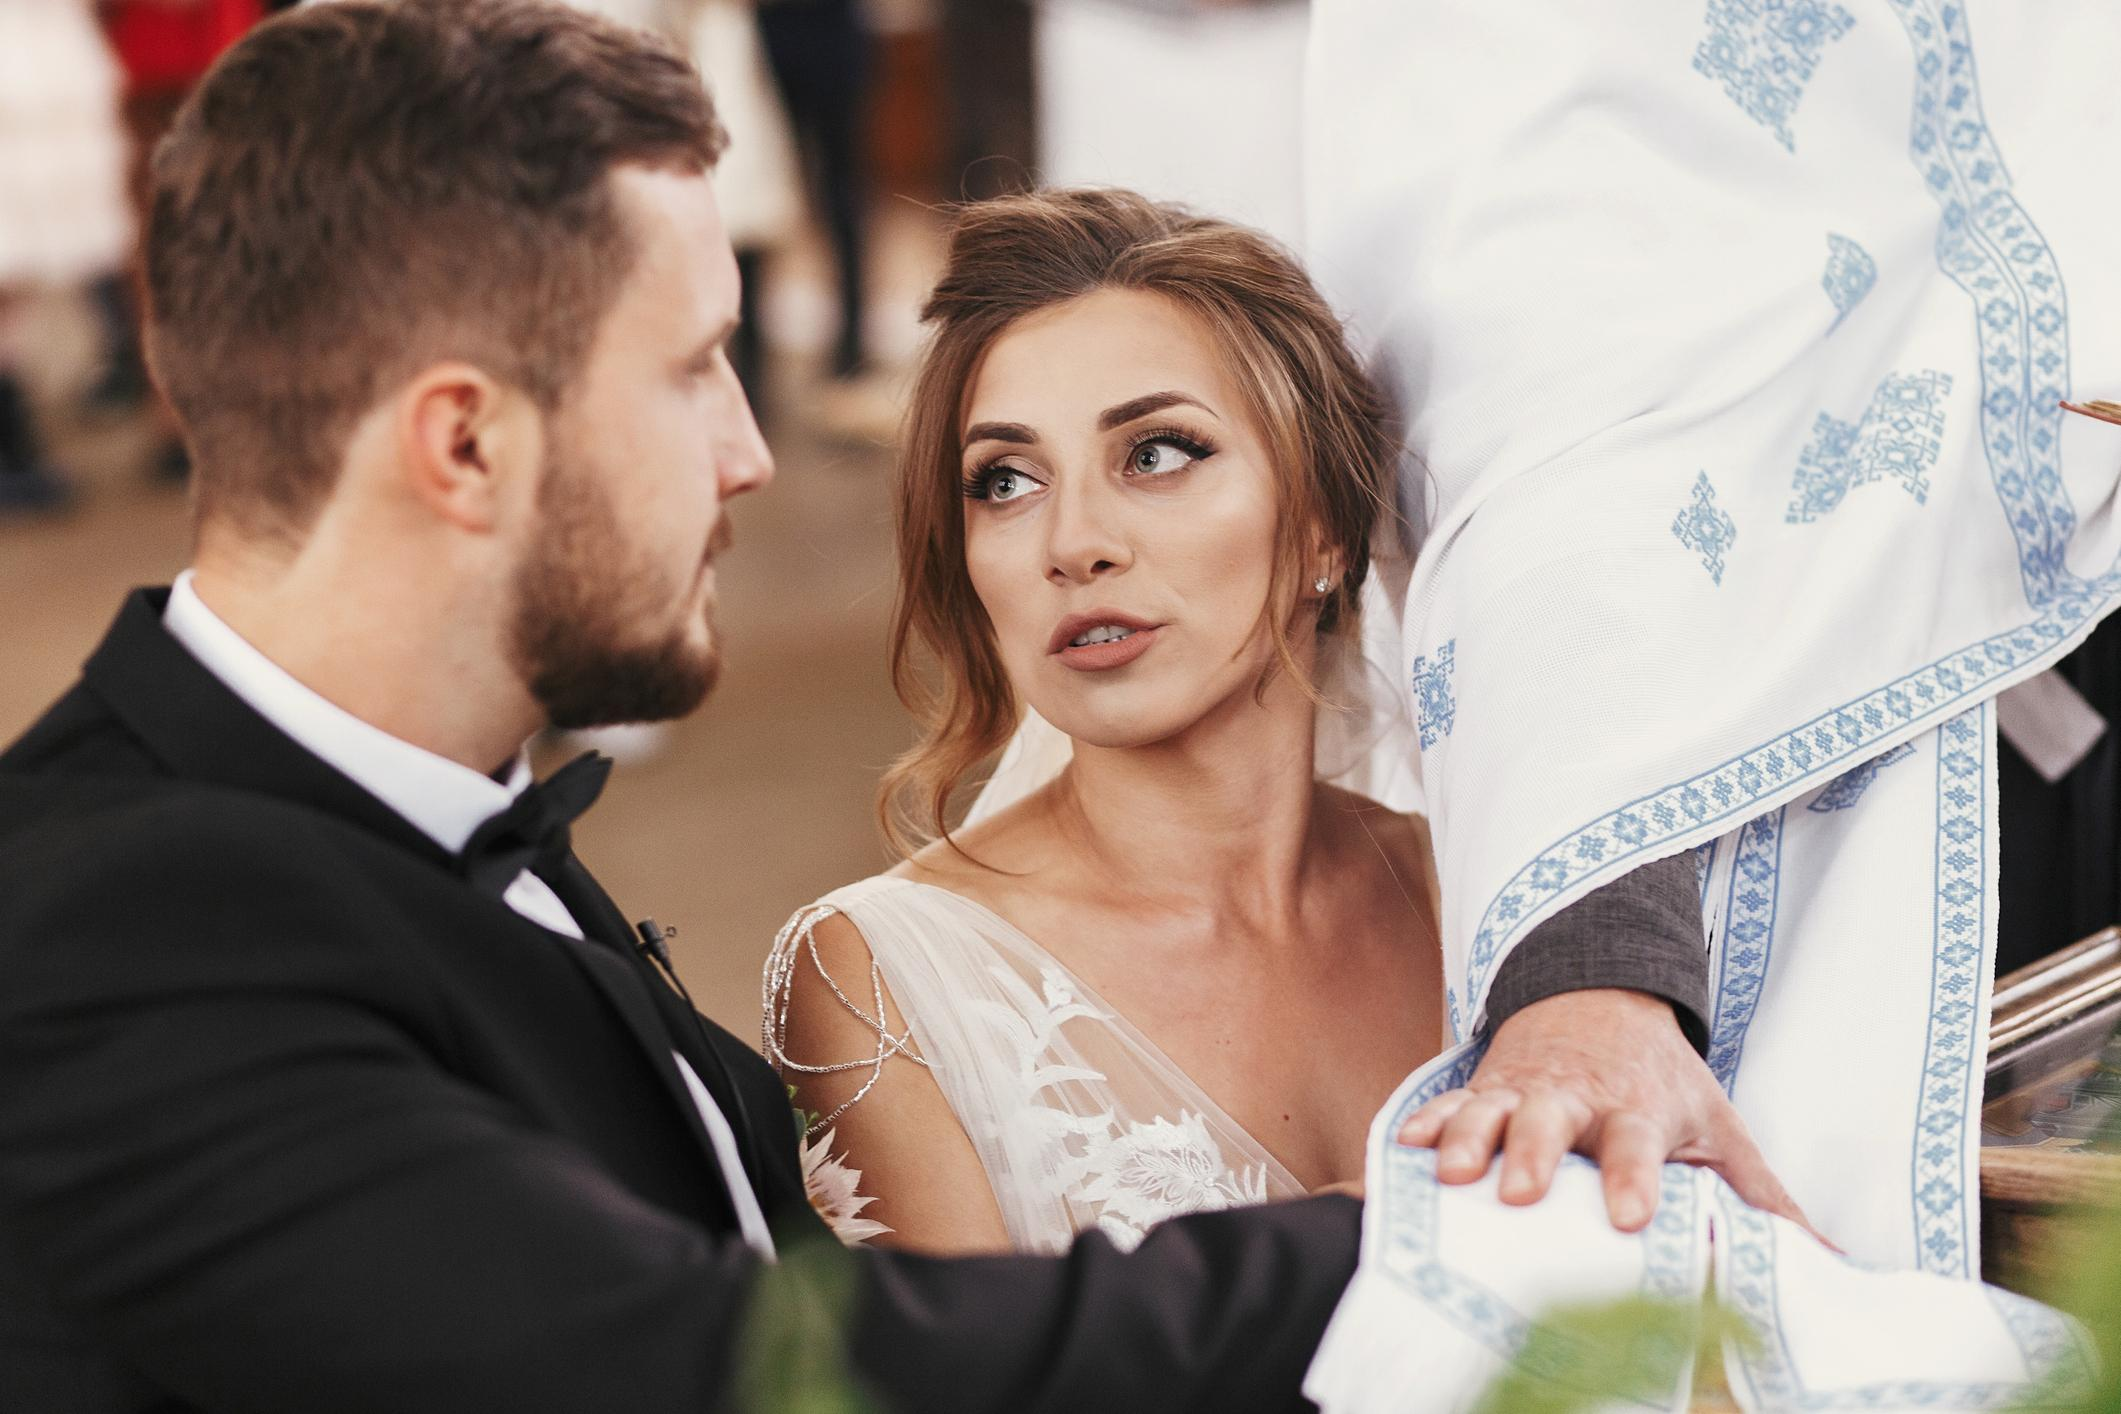 11-wedding-red-flag-vows-1556123444981.jpg